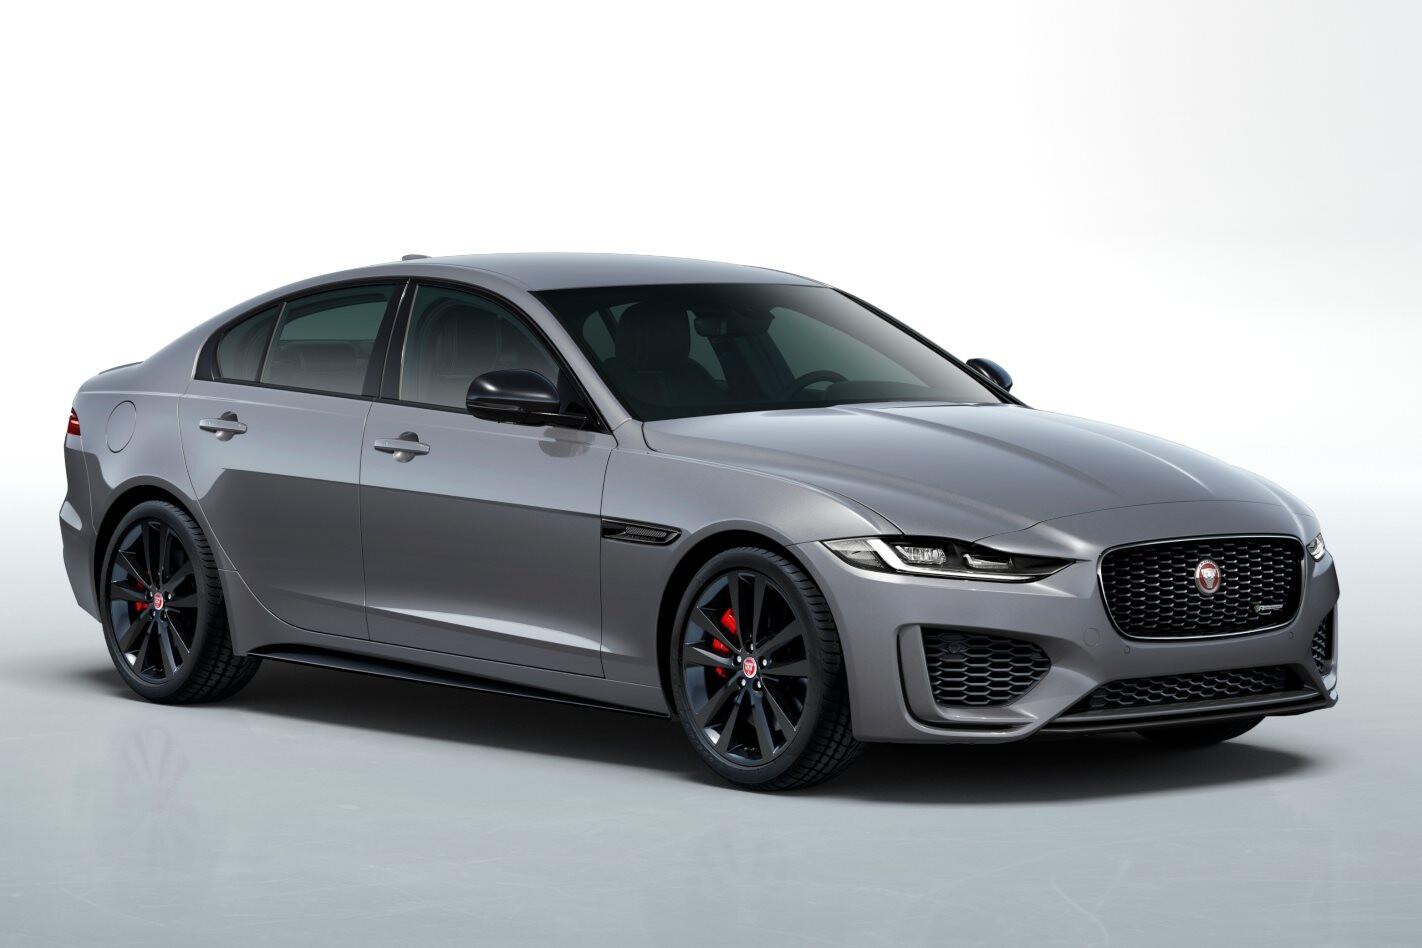 2021 Jaguar XE Black